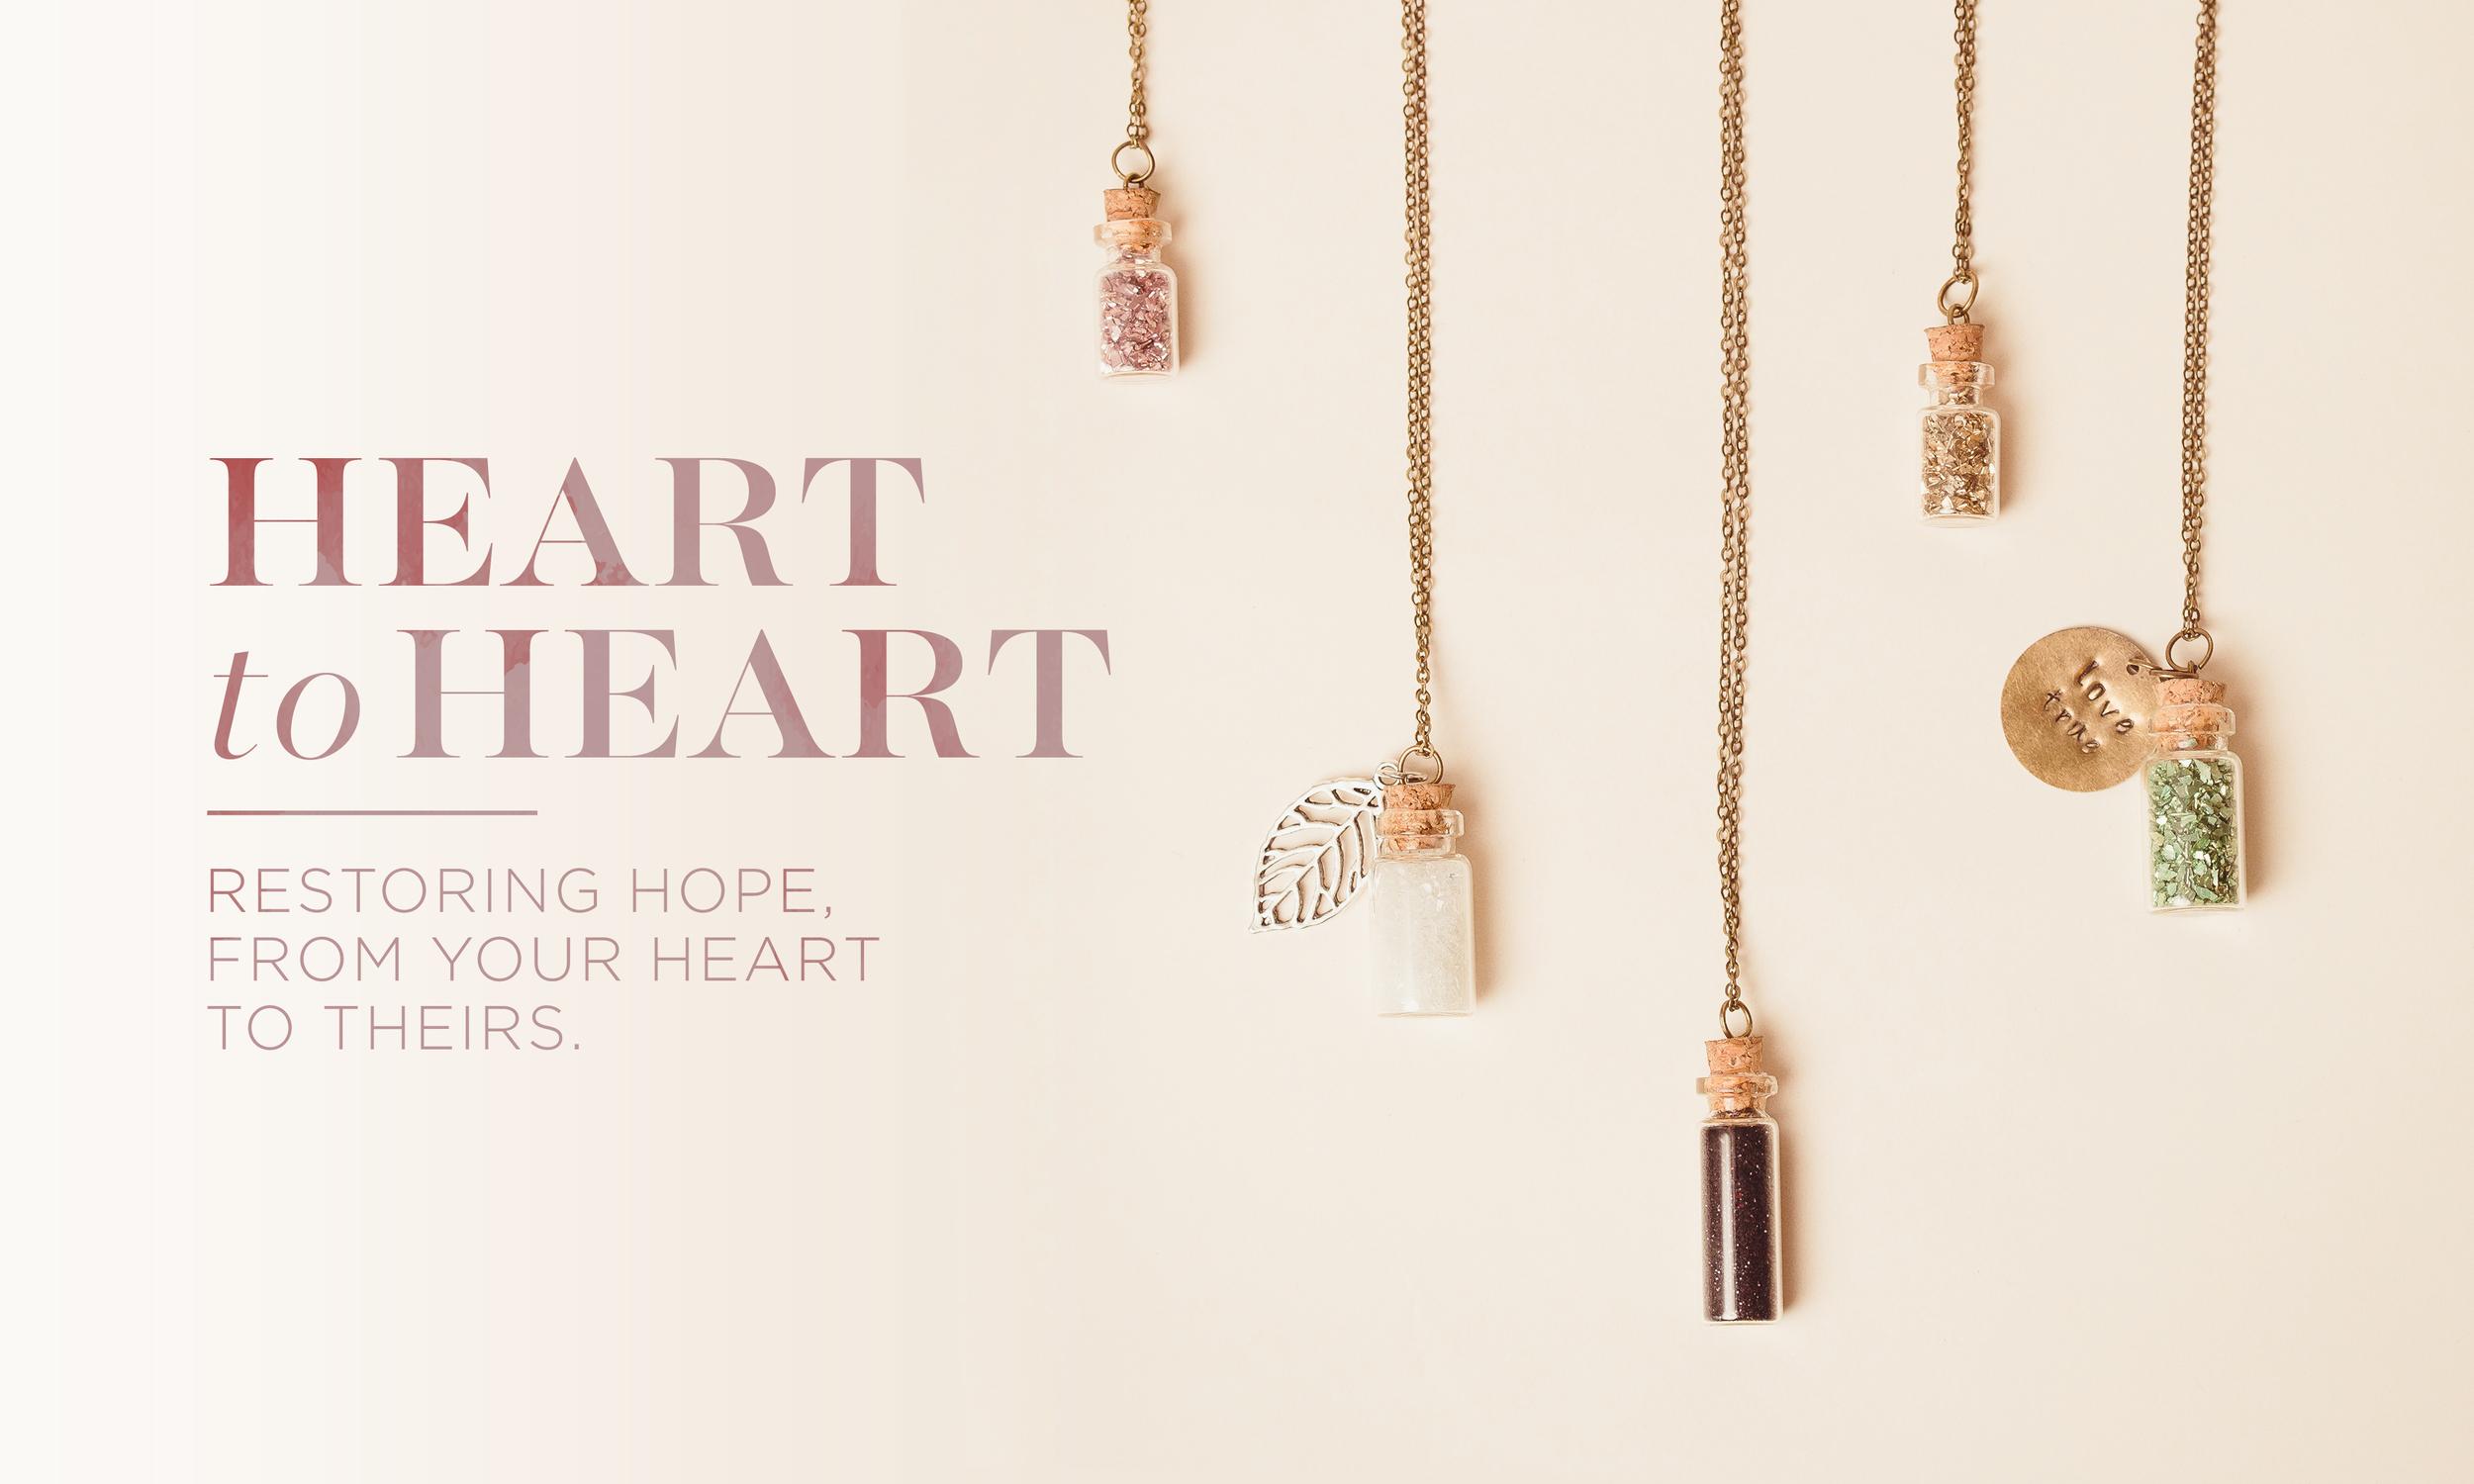 hearttoheart4 (2).jpg